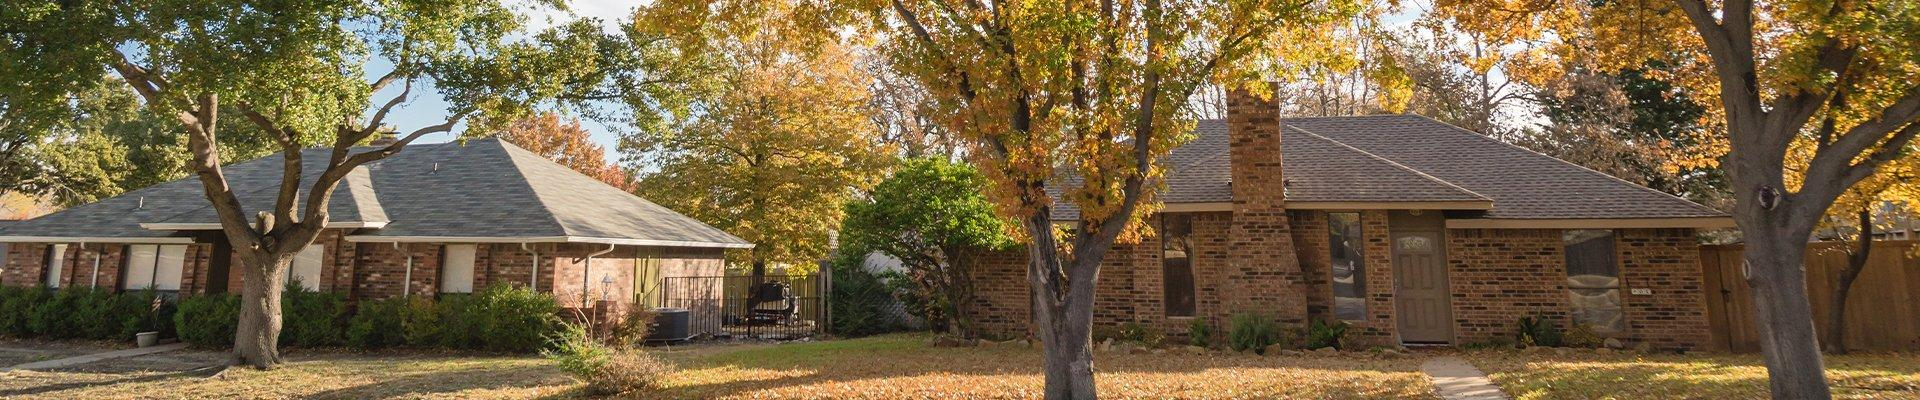 a row of homes in a suburban neighborhood in richmond texas